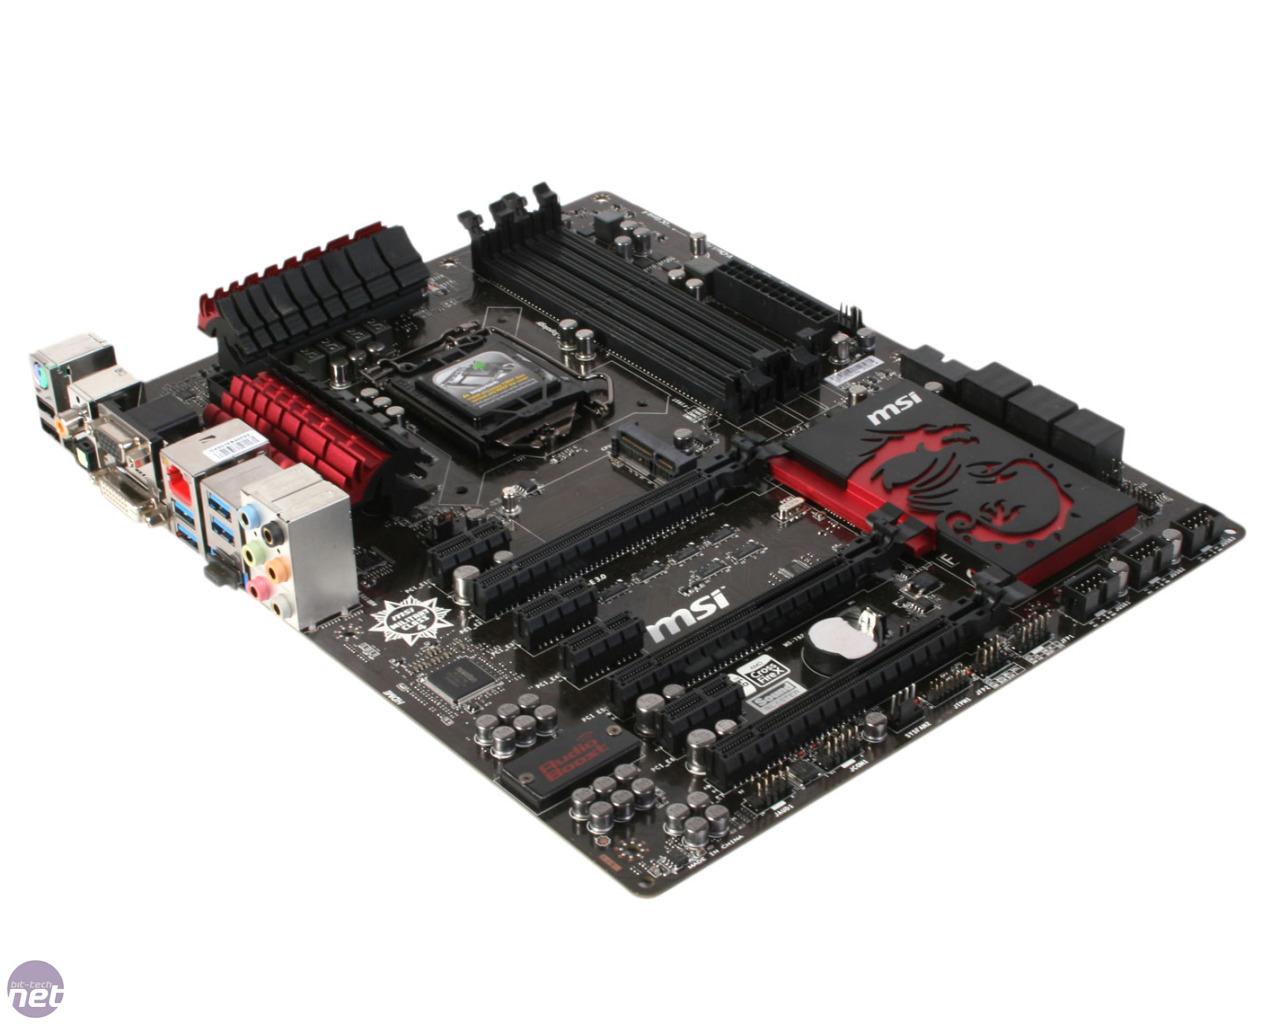 Msi Z87 G45 Gaming Review Bit Tech Net